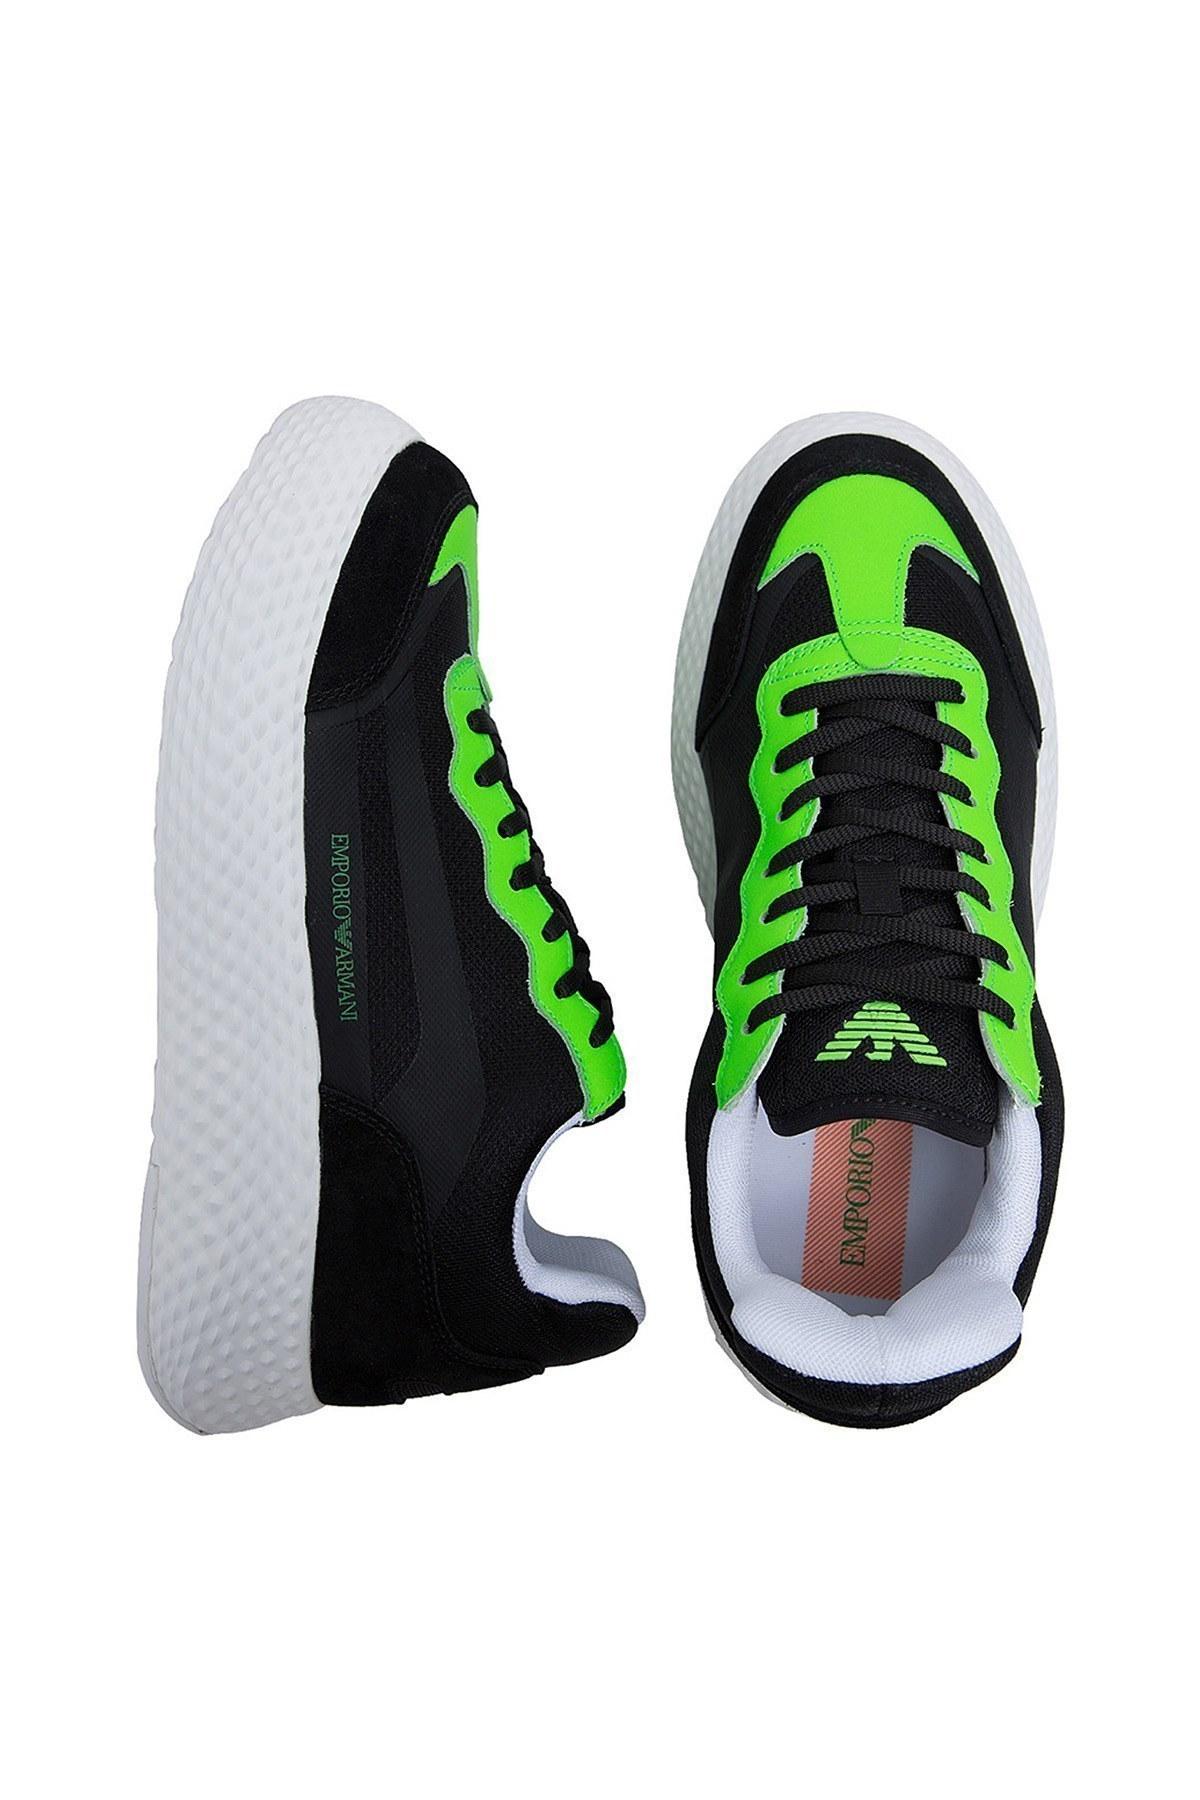 Emporio Armani Erkek Ayakkabı X4X269 XM234 L004 SİYAH